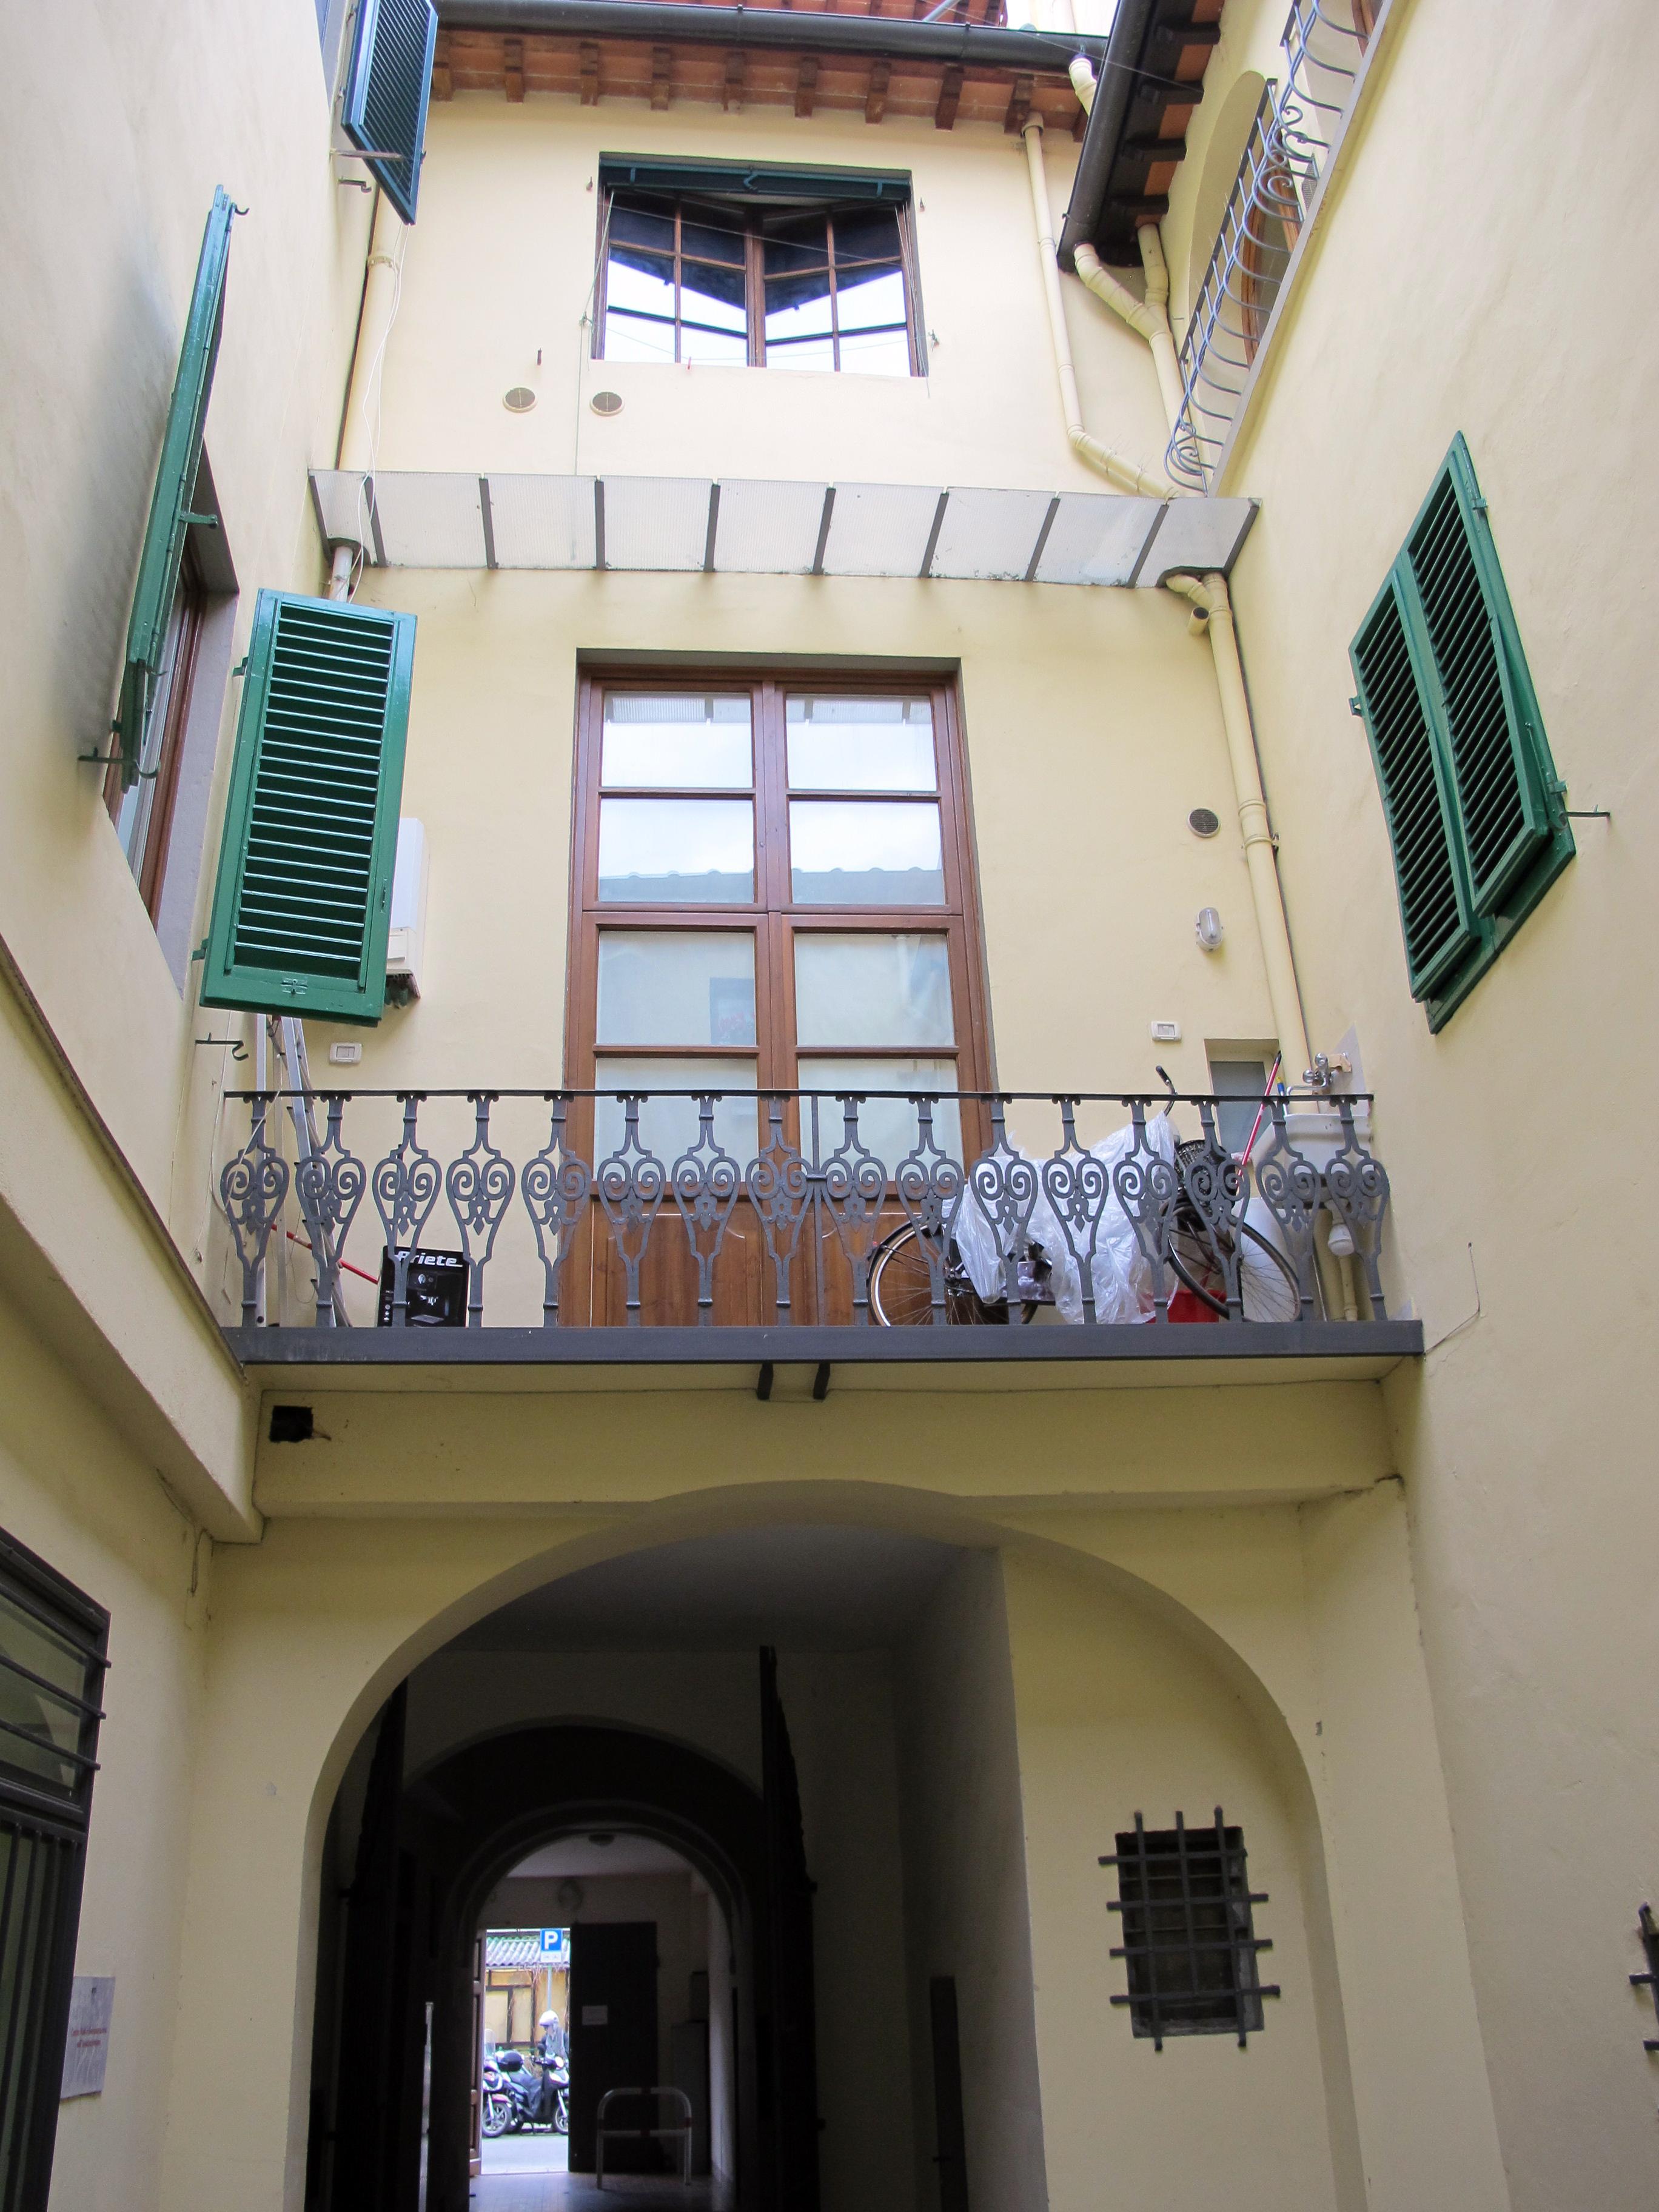 file casa di lorenzo ghiberti cortile 03 jpg wikimedia commons. Black Bedroom Furniture Sets. Home Design Ideas